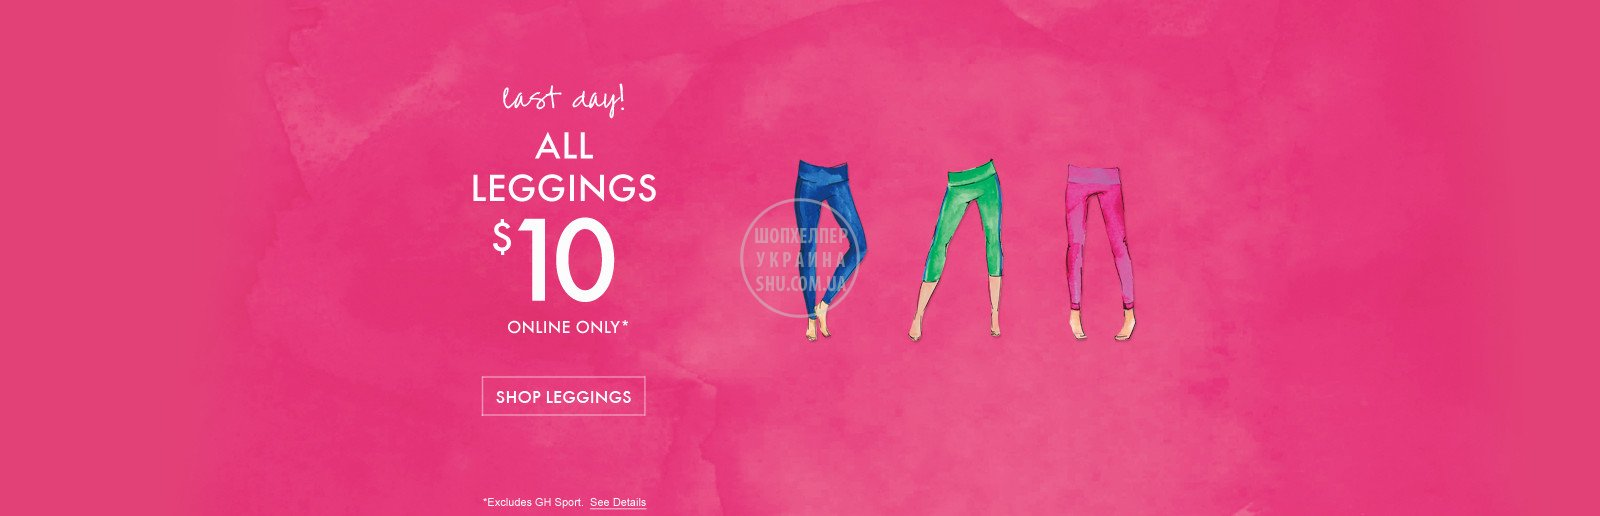 gh-US-20140430-hphero-leggings.jpeg